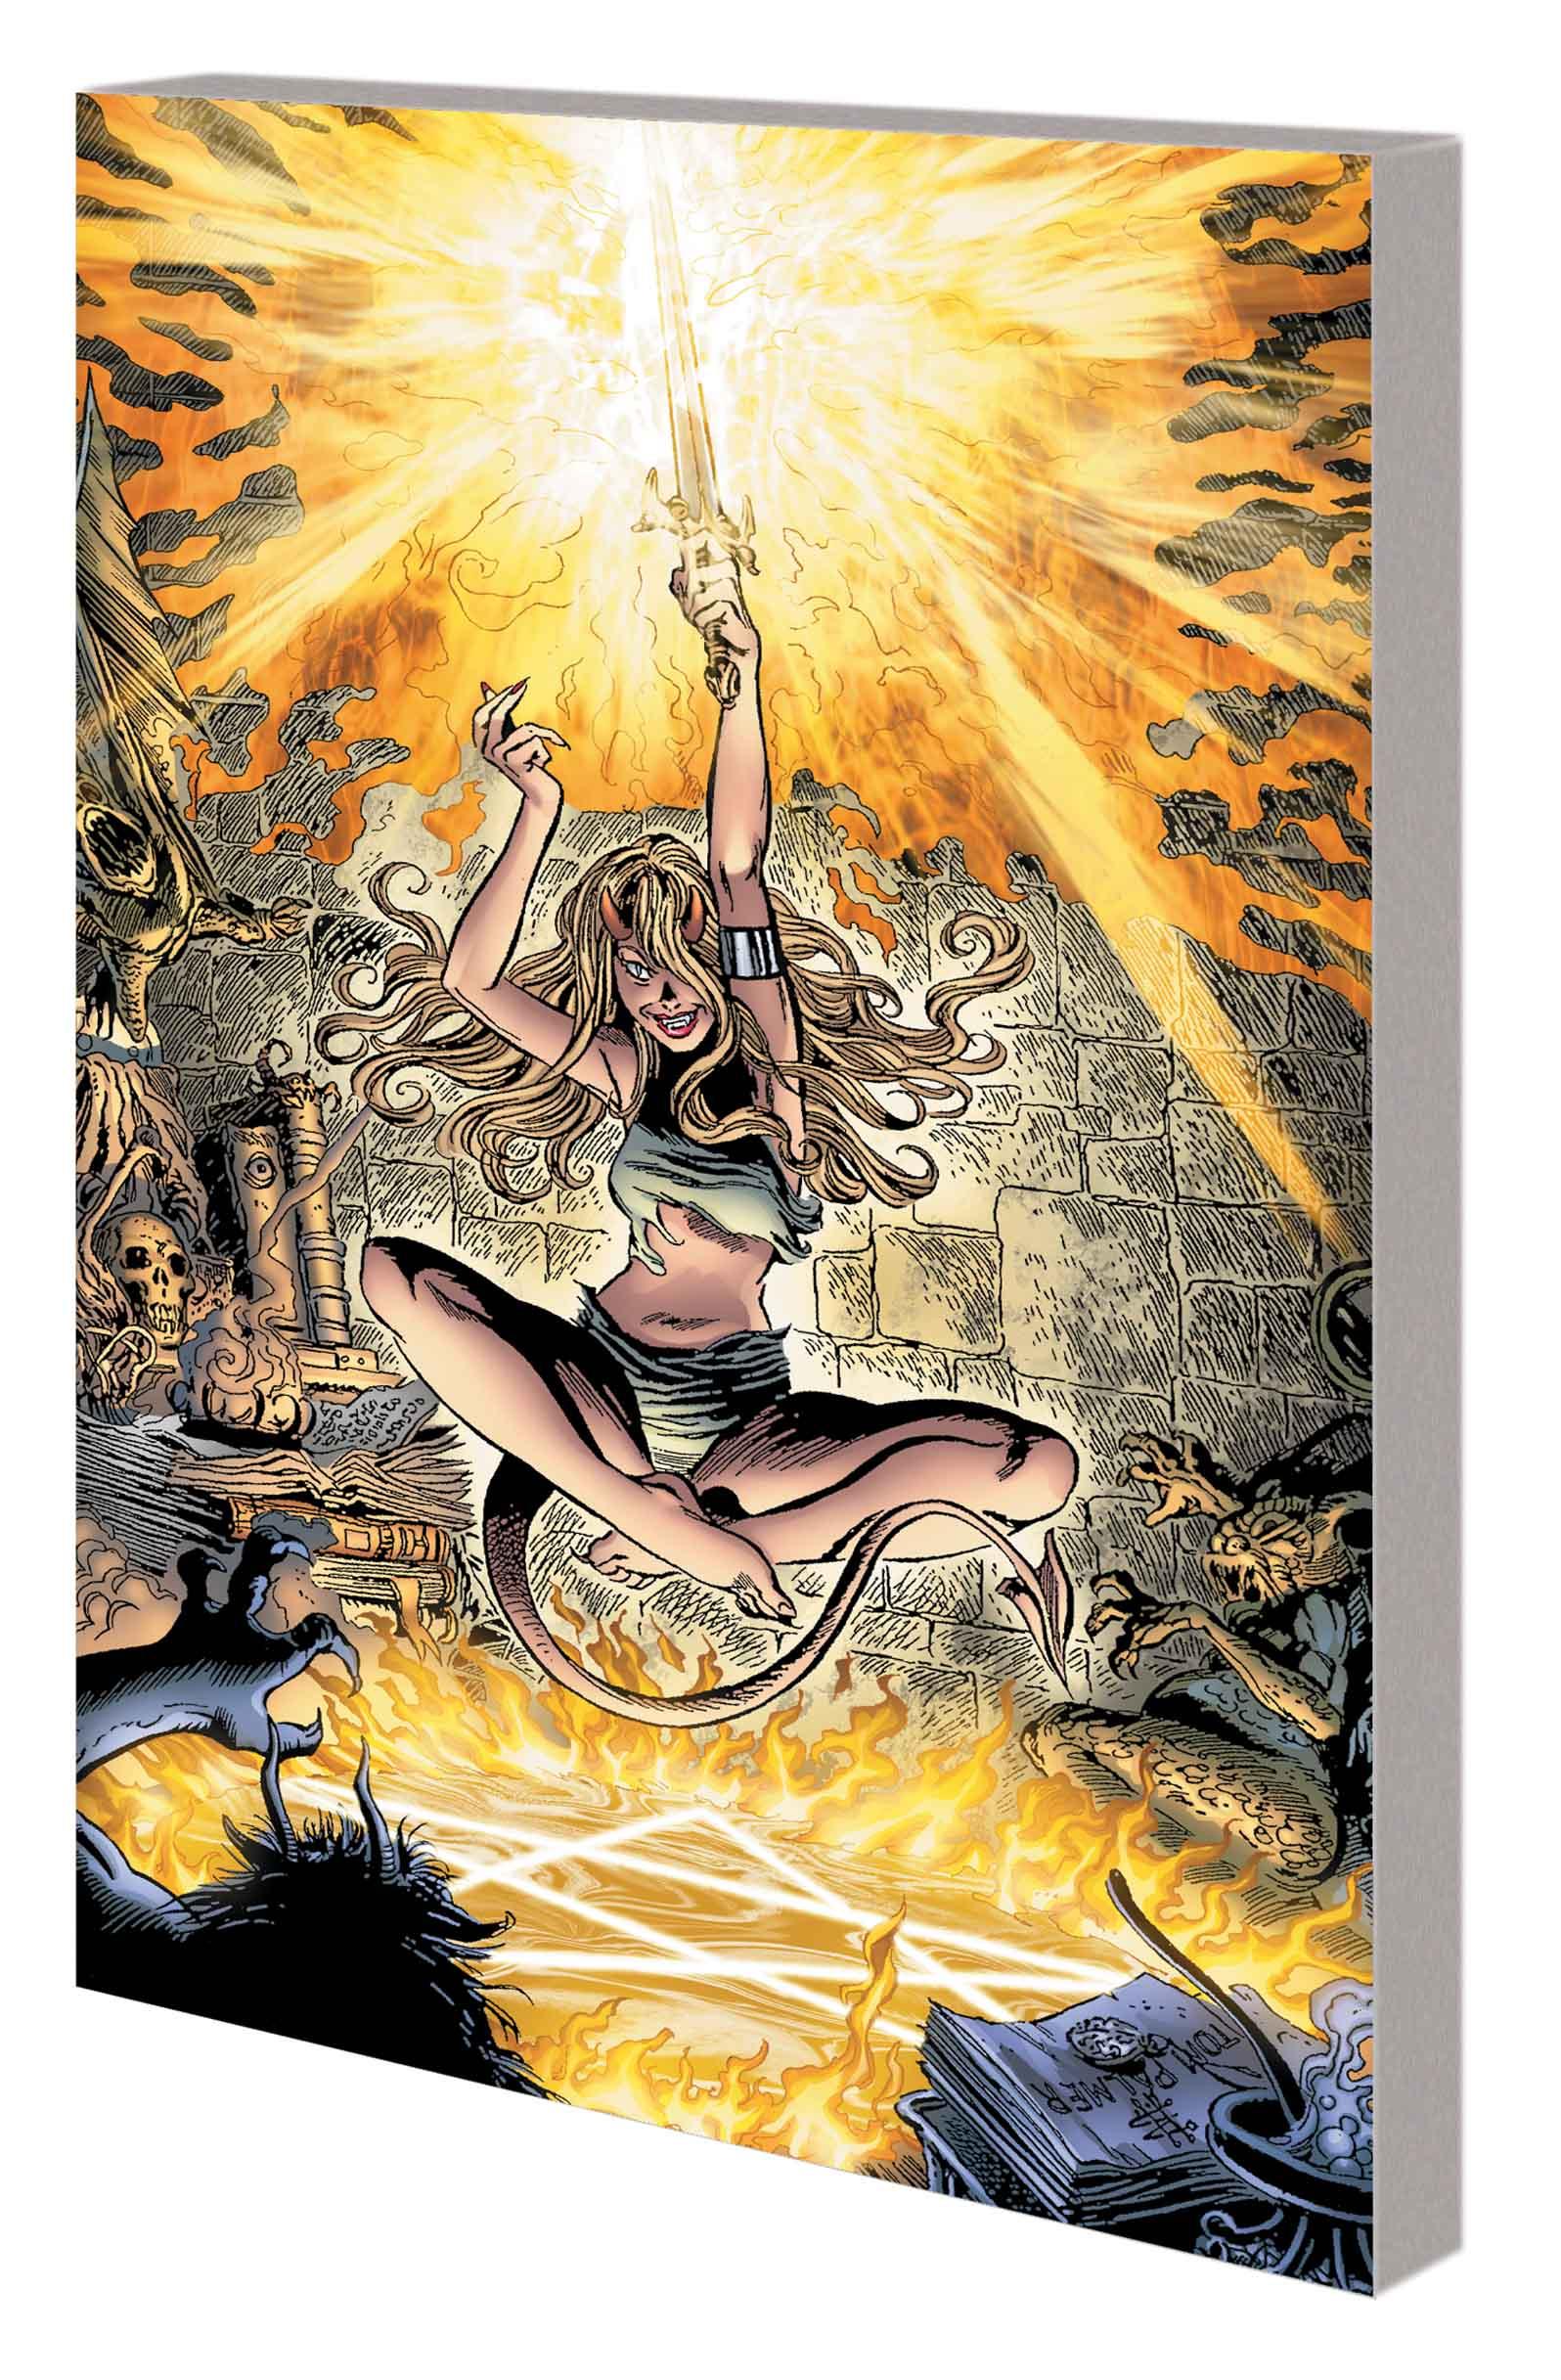 X-MEN: MAGIK - STORM & ILLYANA TPB (Trade Paperback)